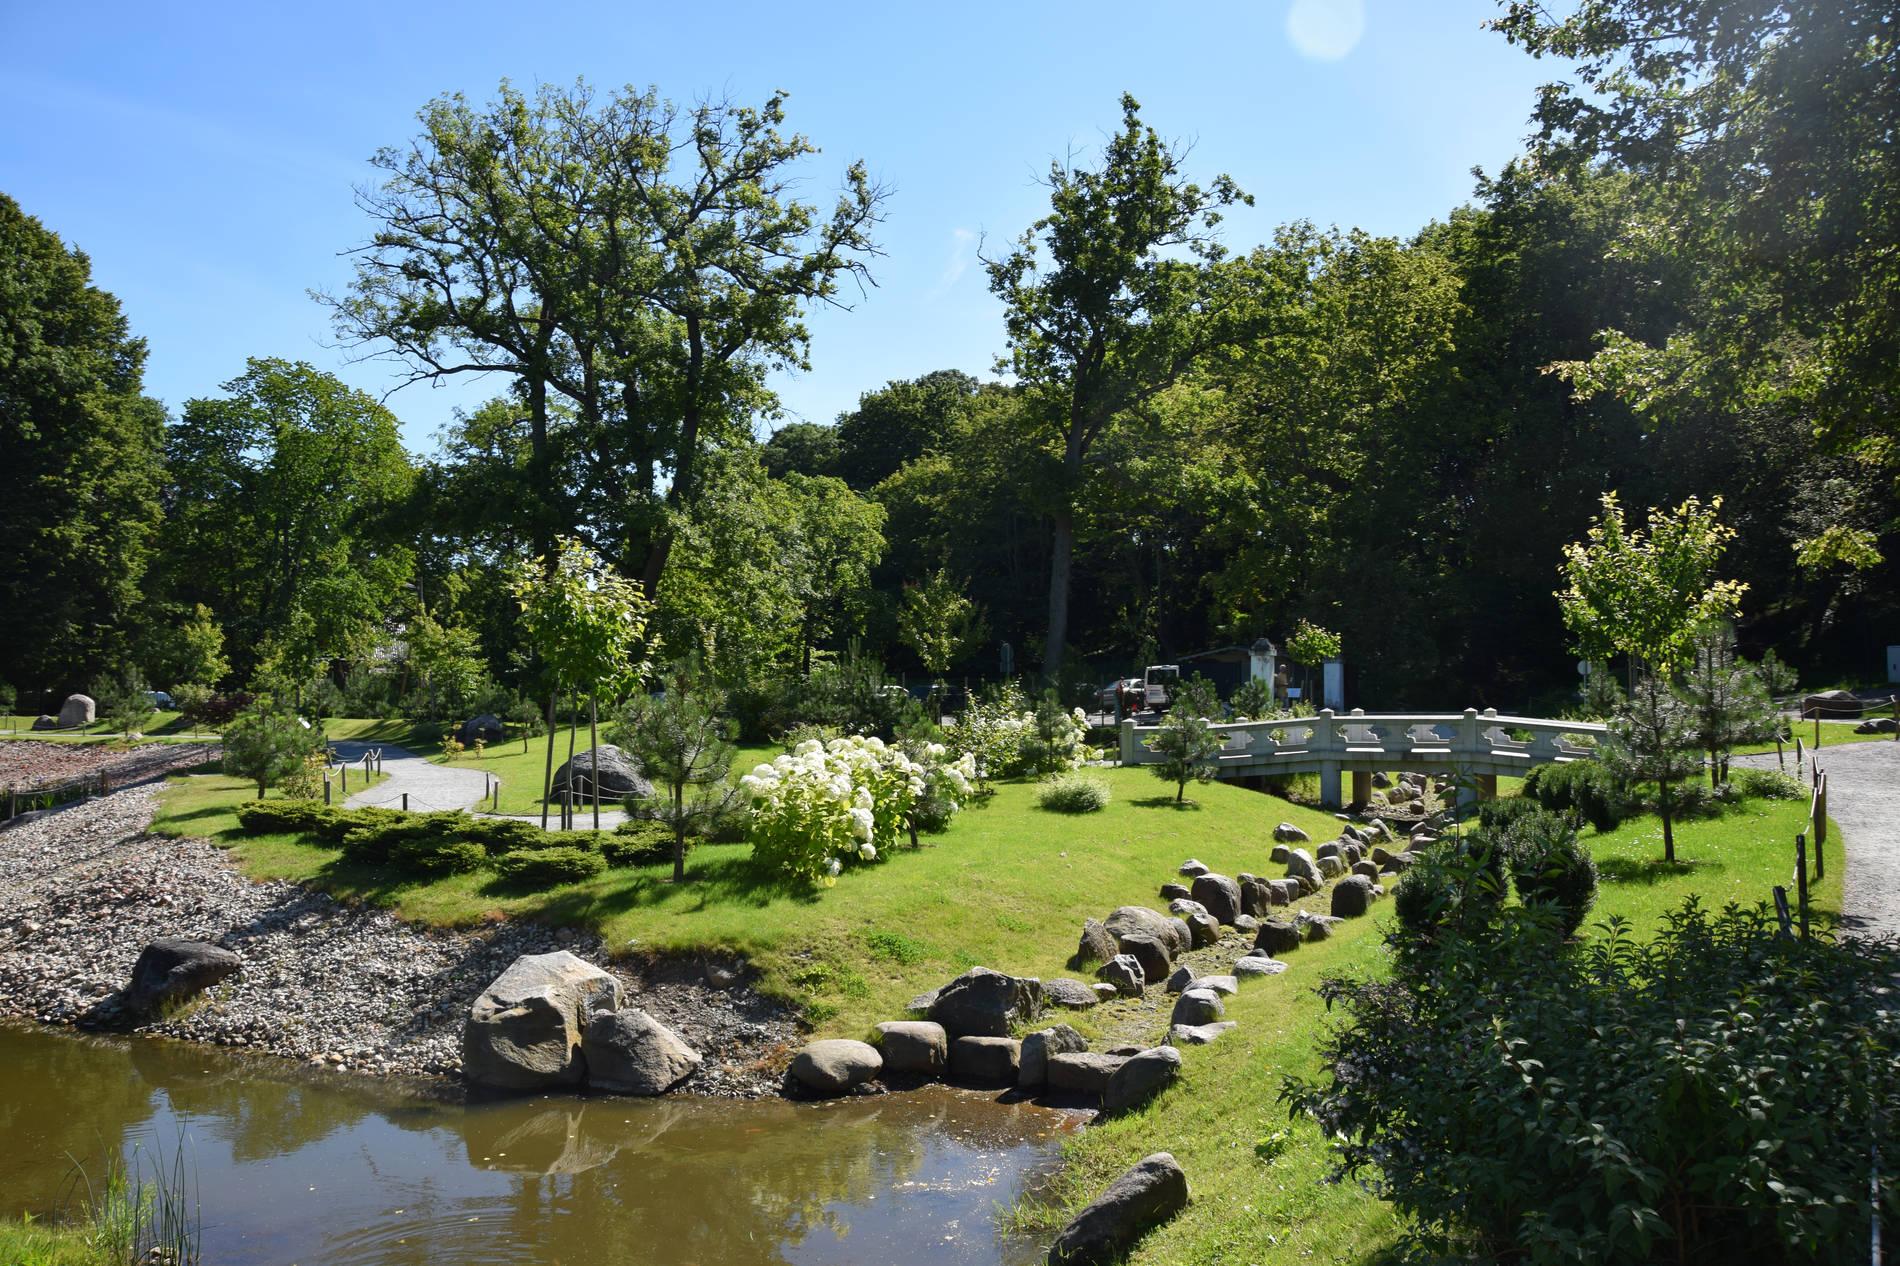 The Japanese Garden in Kadriorg Park in Tallinn, Estonia